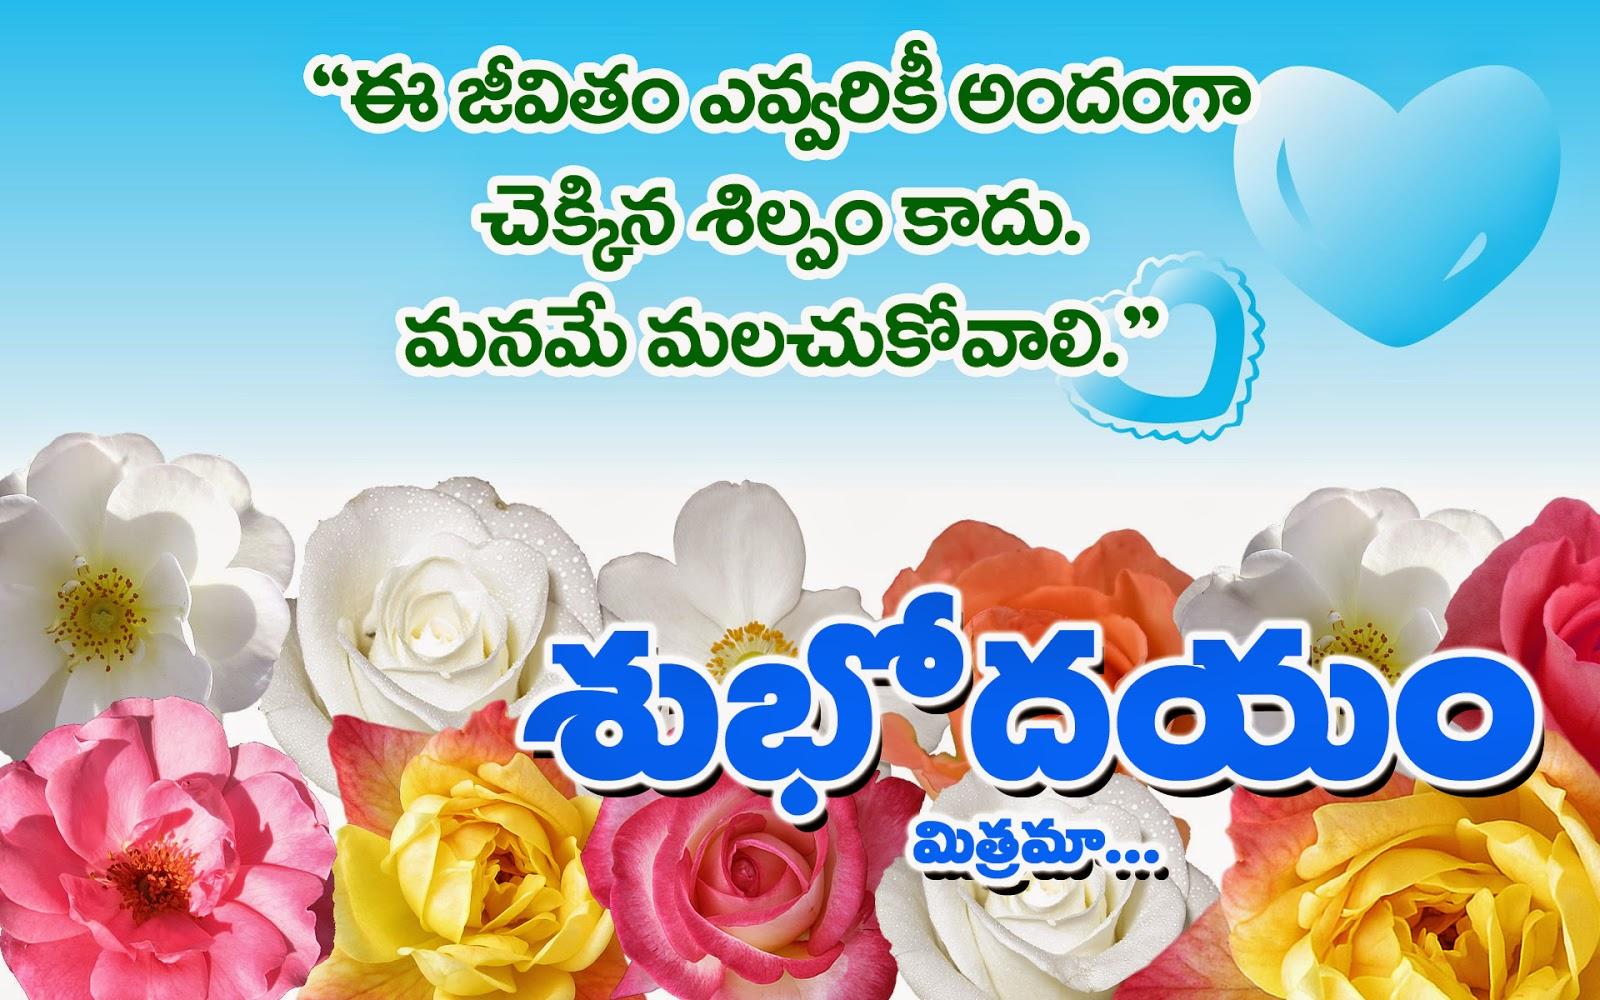 Image Of Telugu Funny Good Morning Images Hd Earn Money Online Earn